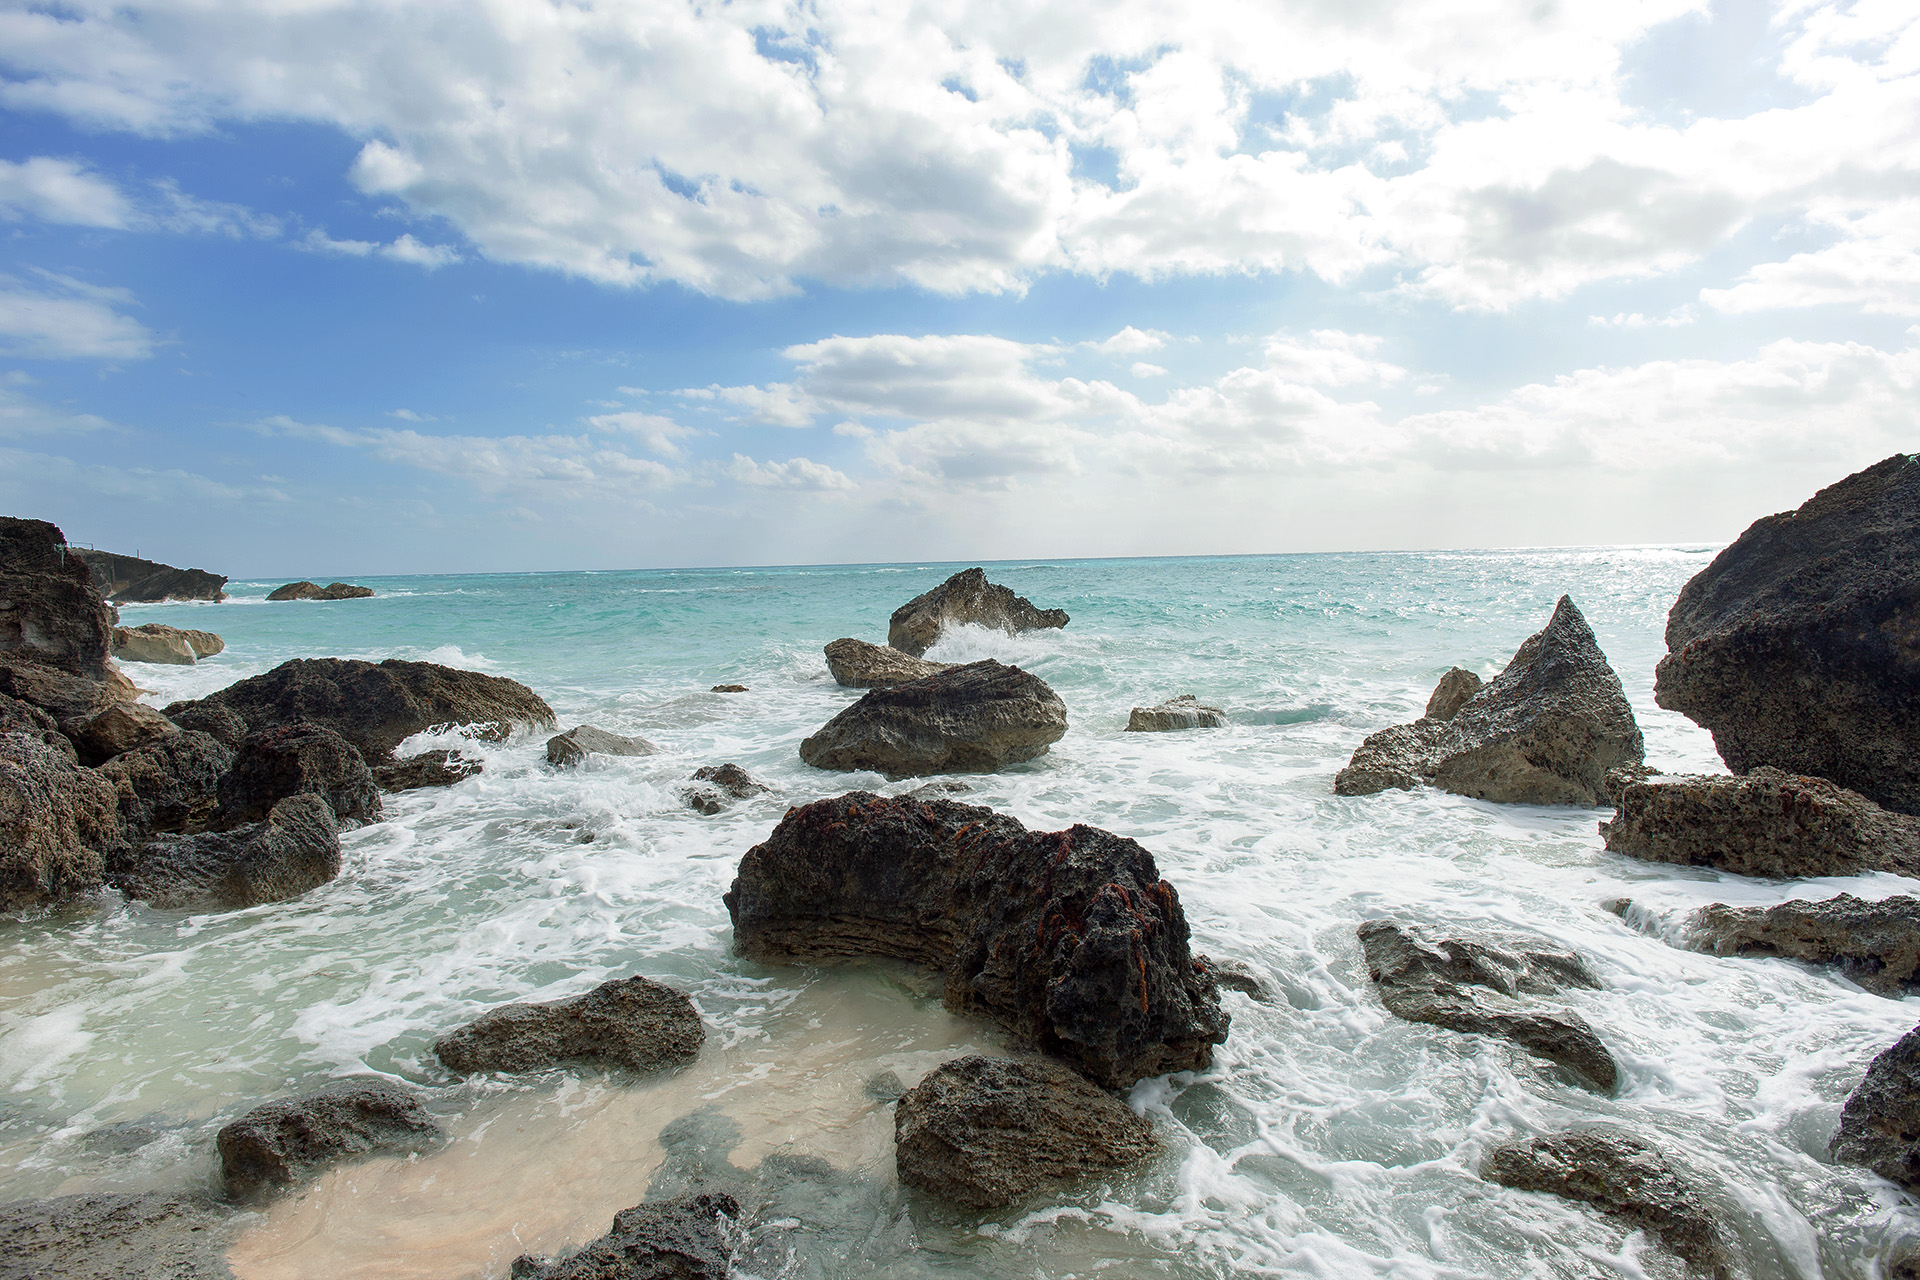 Dramatic rocks on the beach.